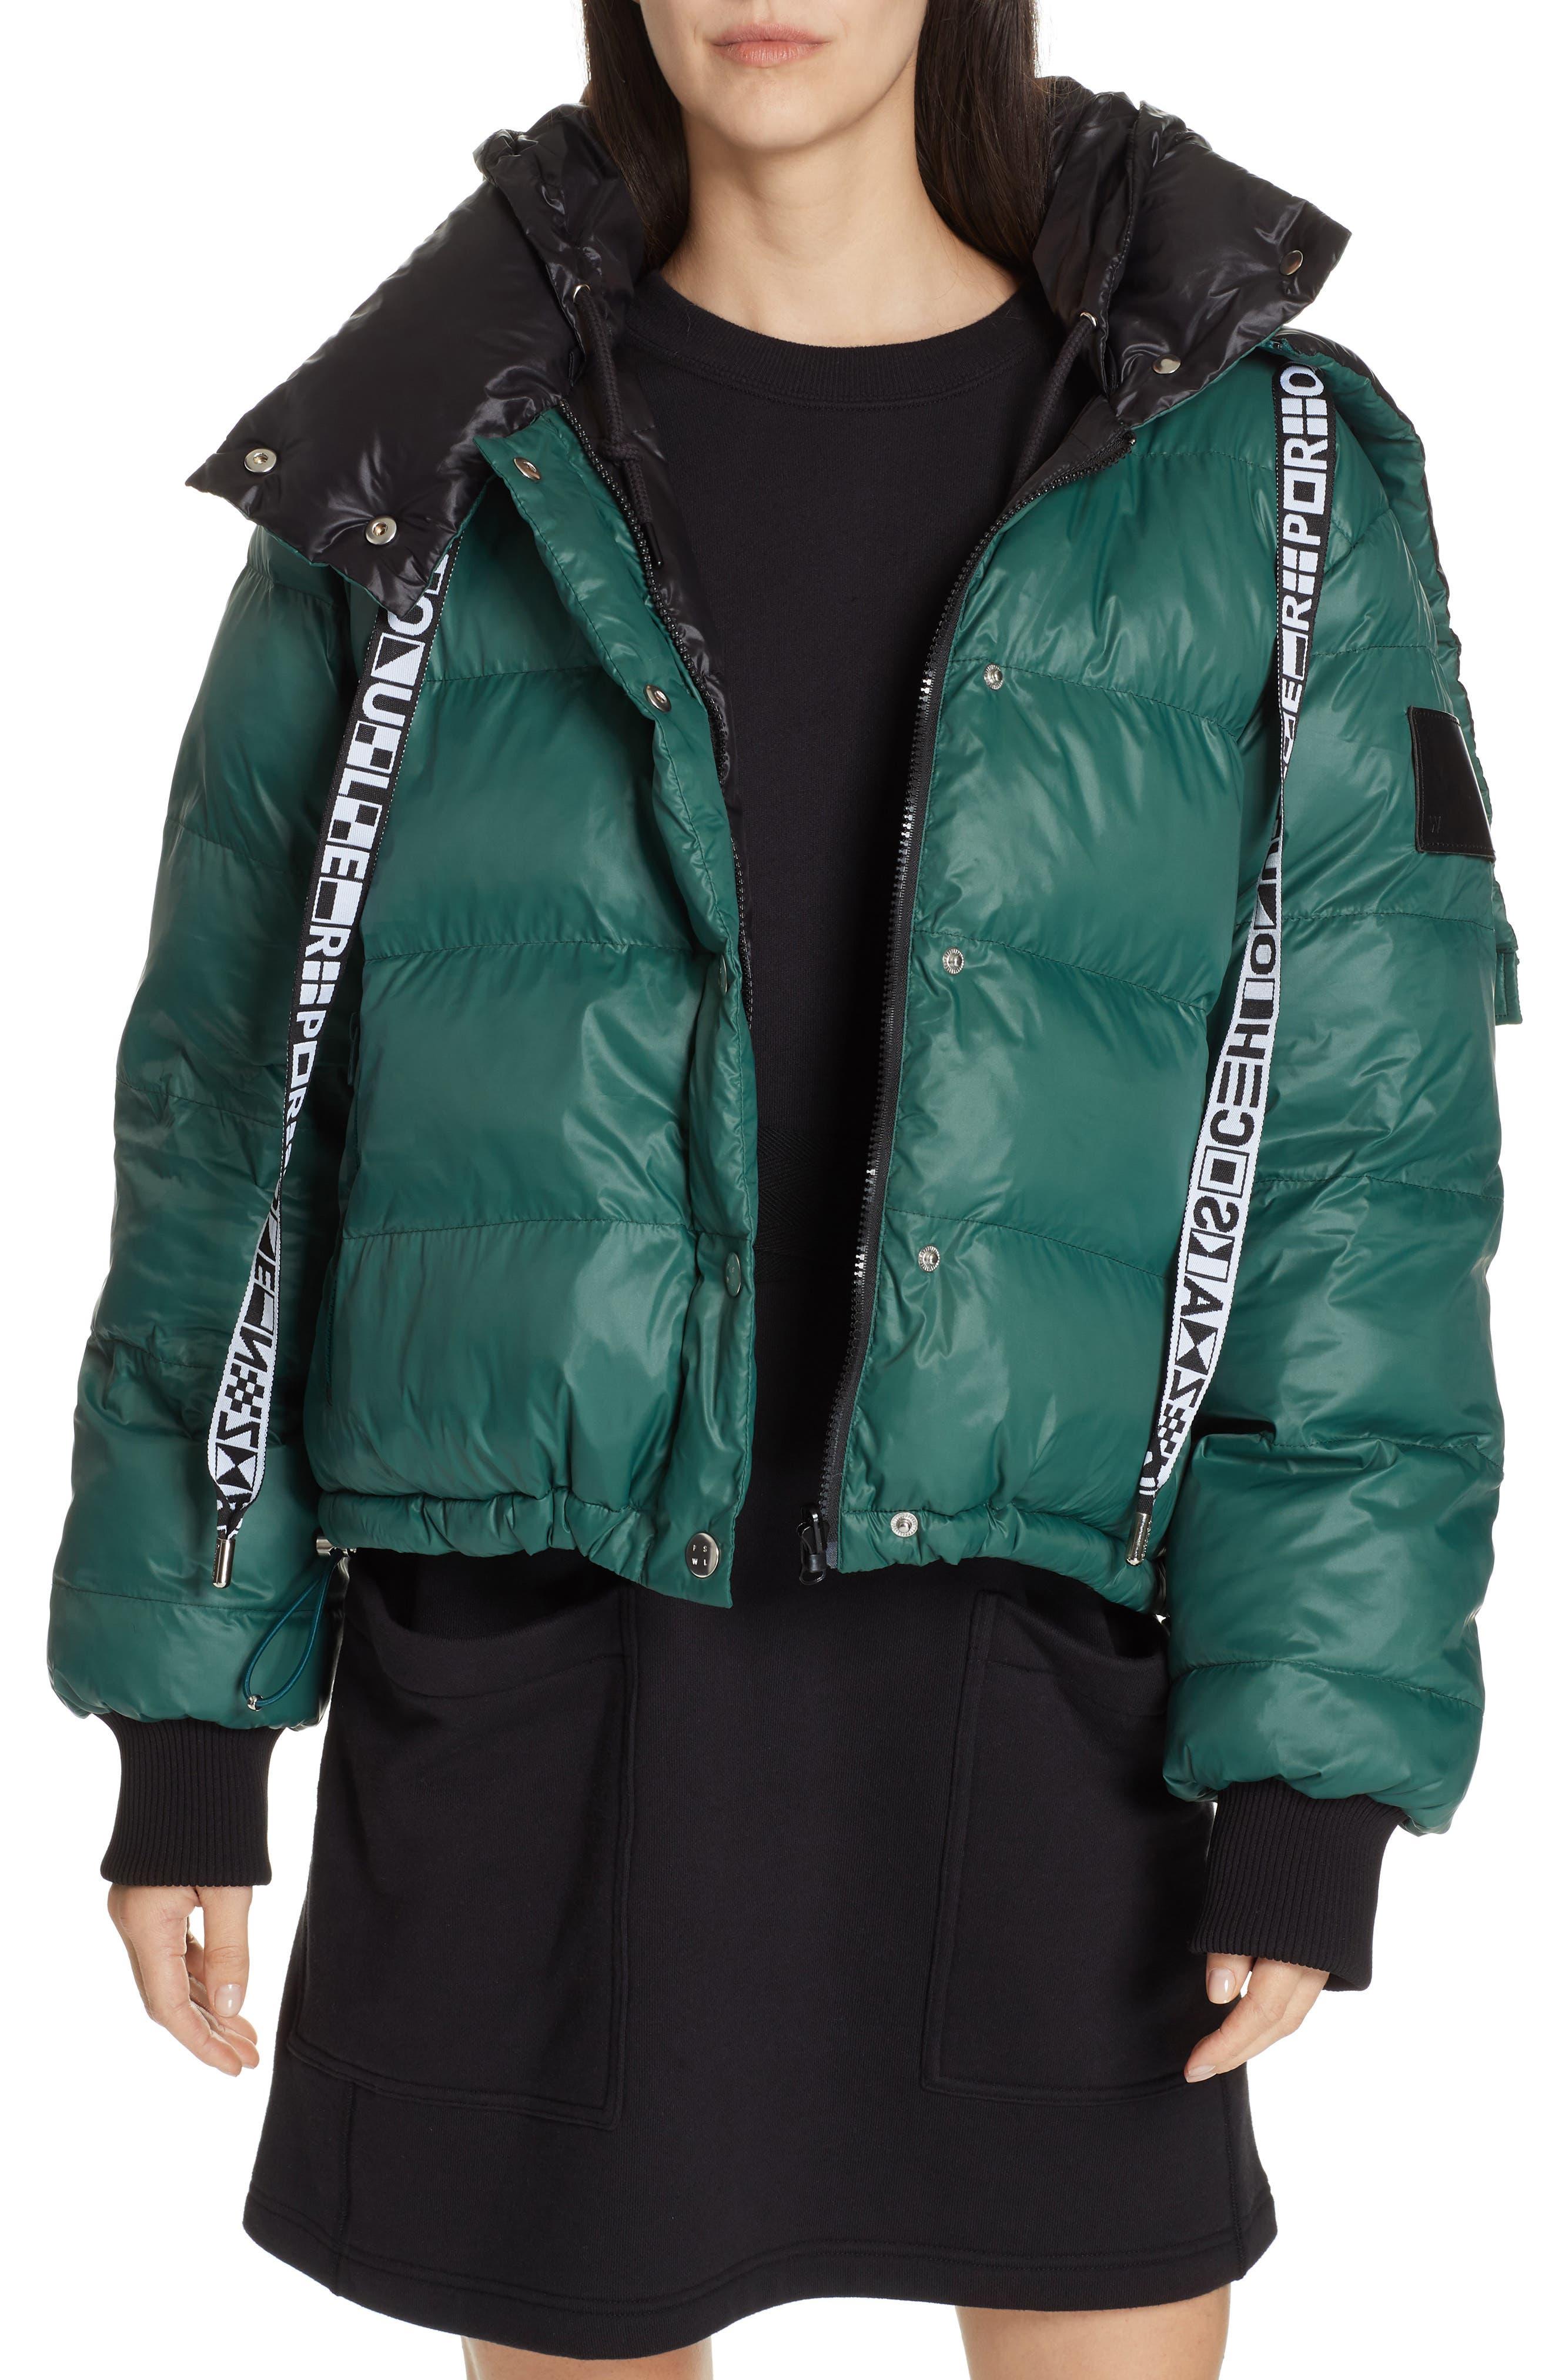 PROENZA SCHOULER, PSWL Reversible Puffer Coat, Main thumbnail 1, color, GREEN/ BLACK